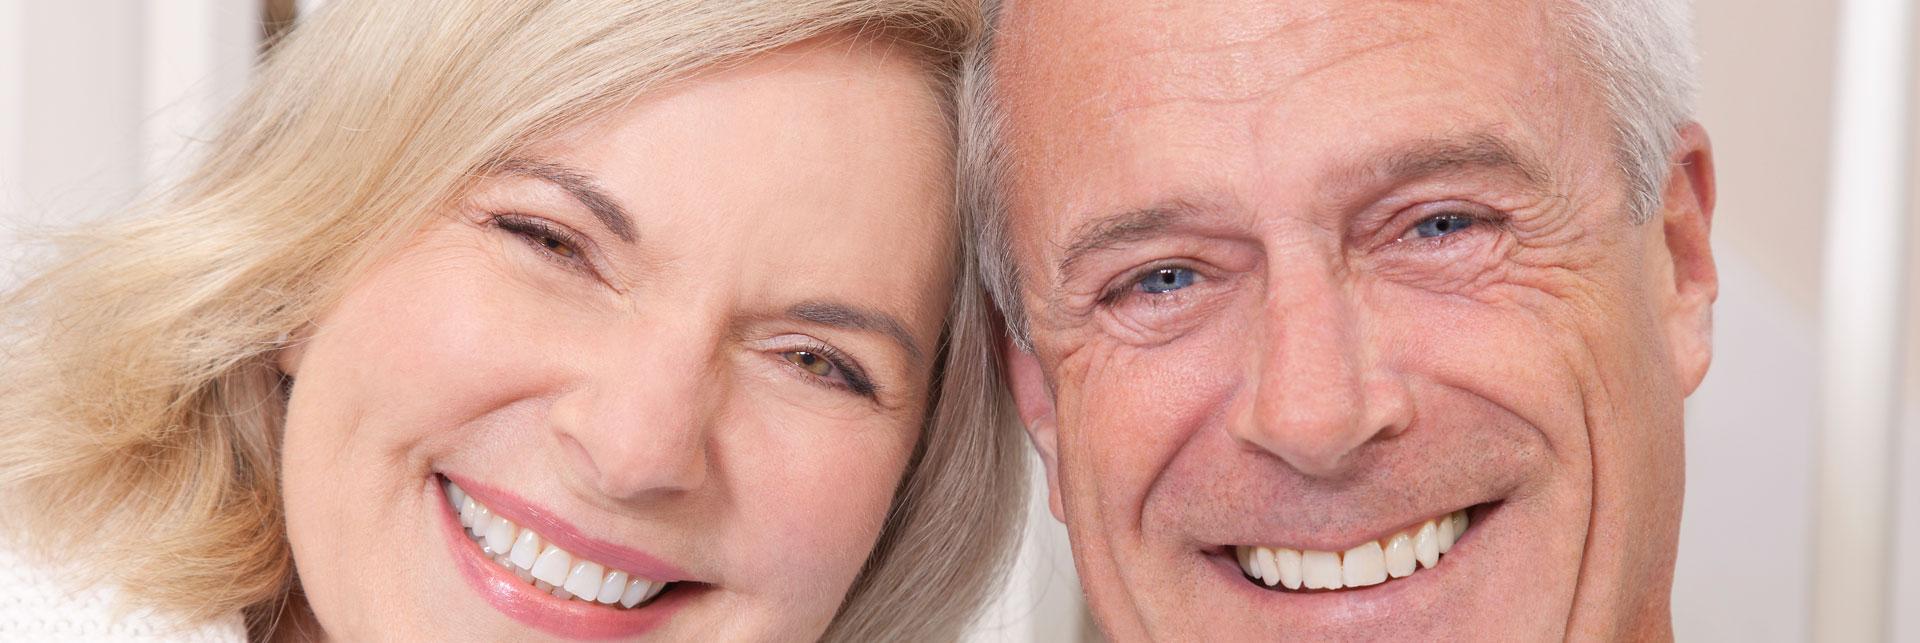 Happy senior couple who had a general dentistry treatment